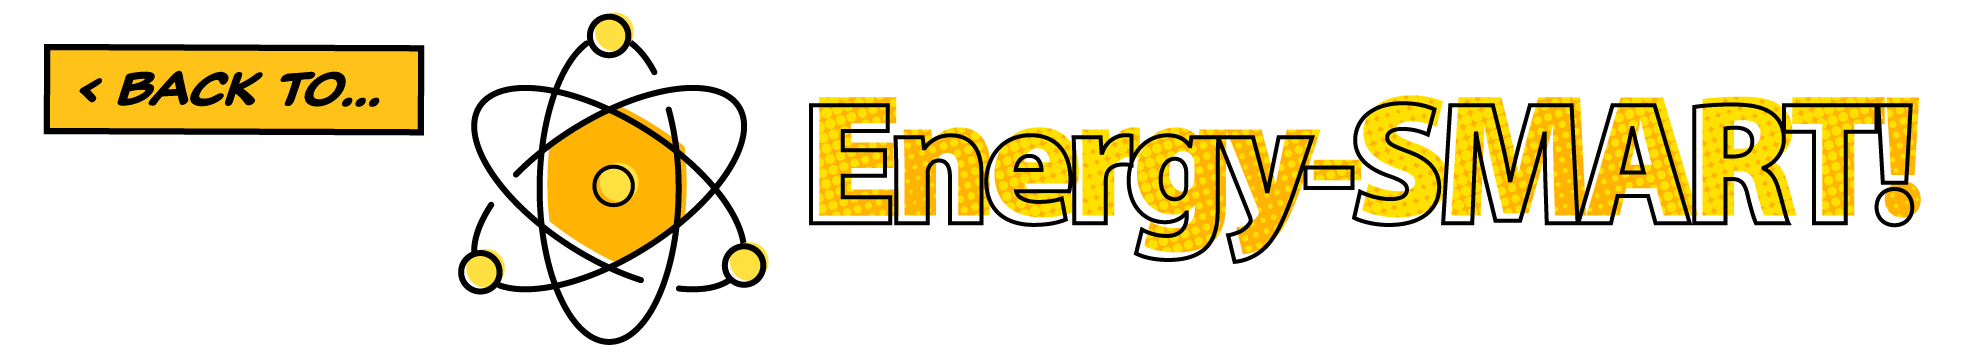 66510 Energy SMART subpage bnr 1970x220 trans